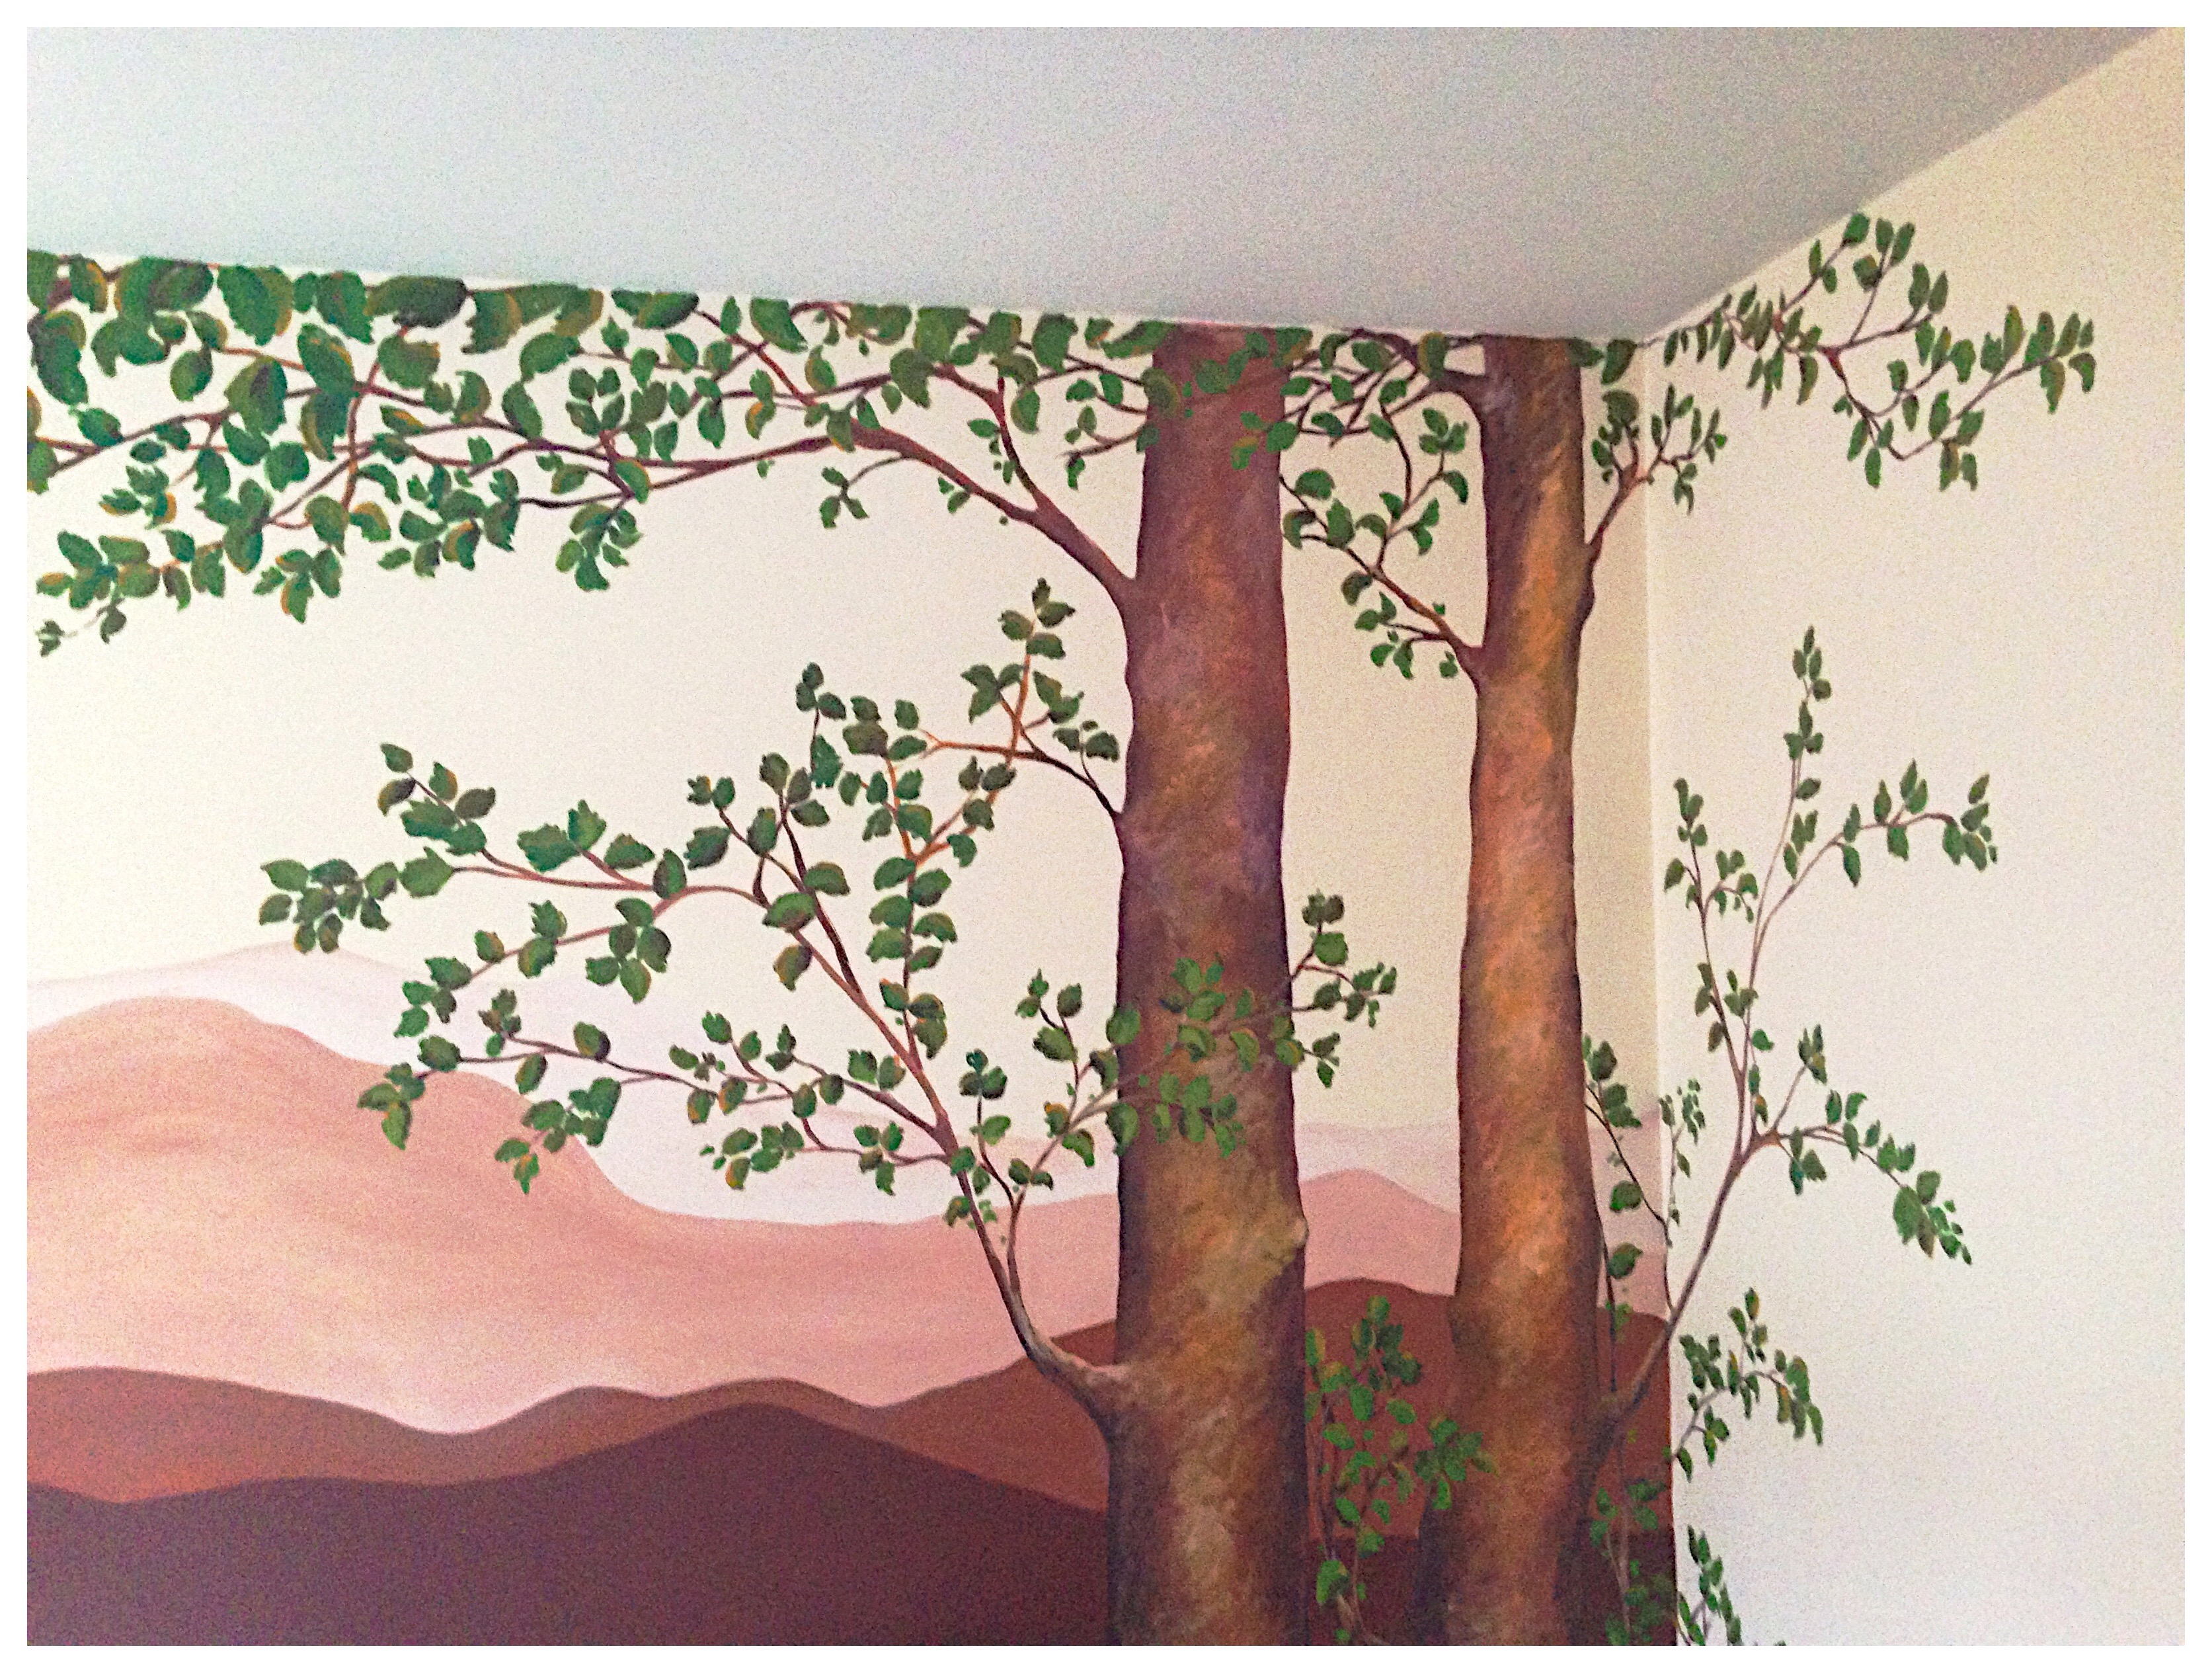 #mural, #decoraciòn, #muralpaint, #dormitorio, #paisaje, #árboles, #begoperezherrera, #bgophycolorincolorado, #montañas, #decoration, #vigo, ##galicia